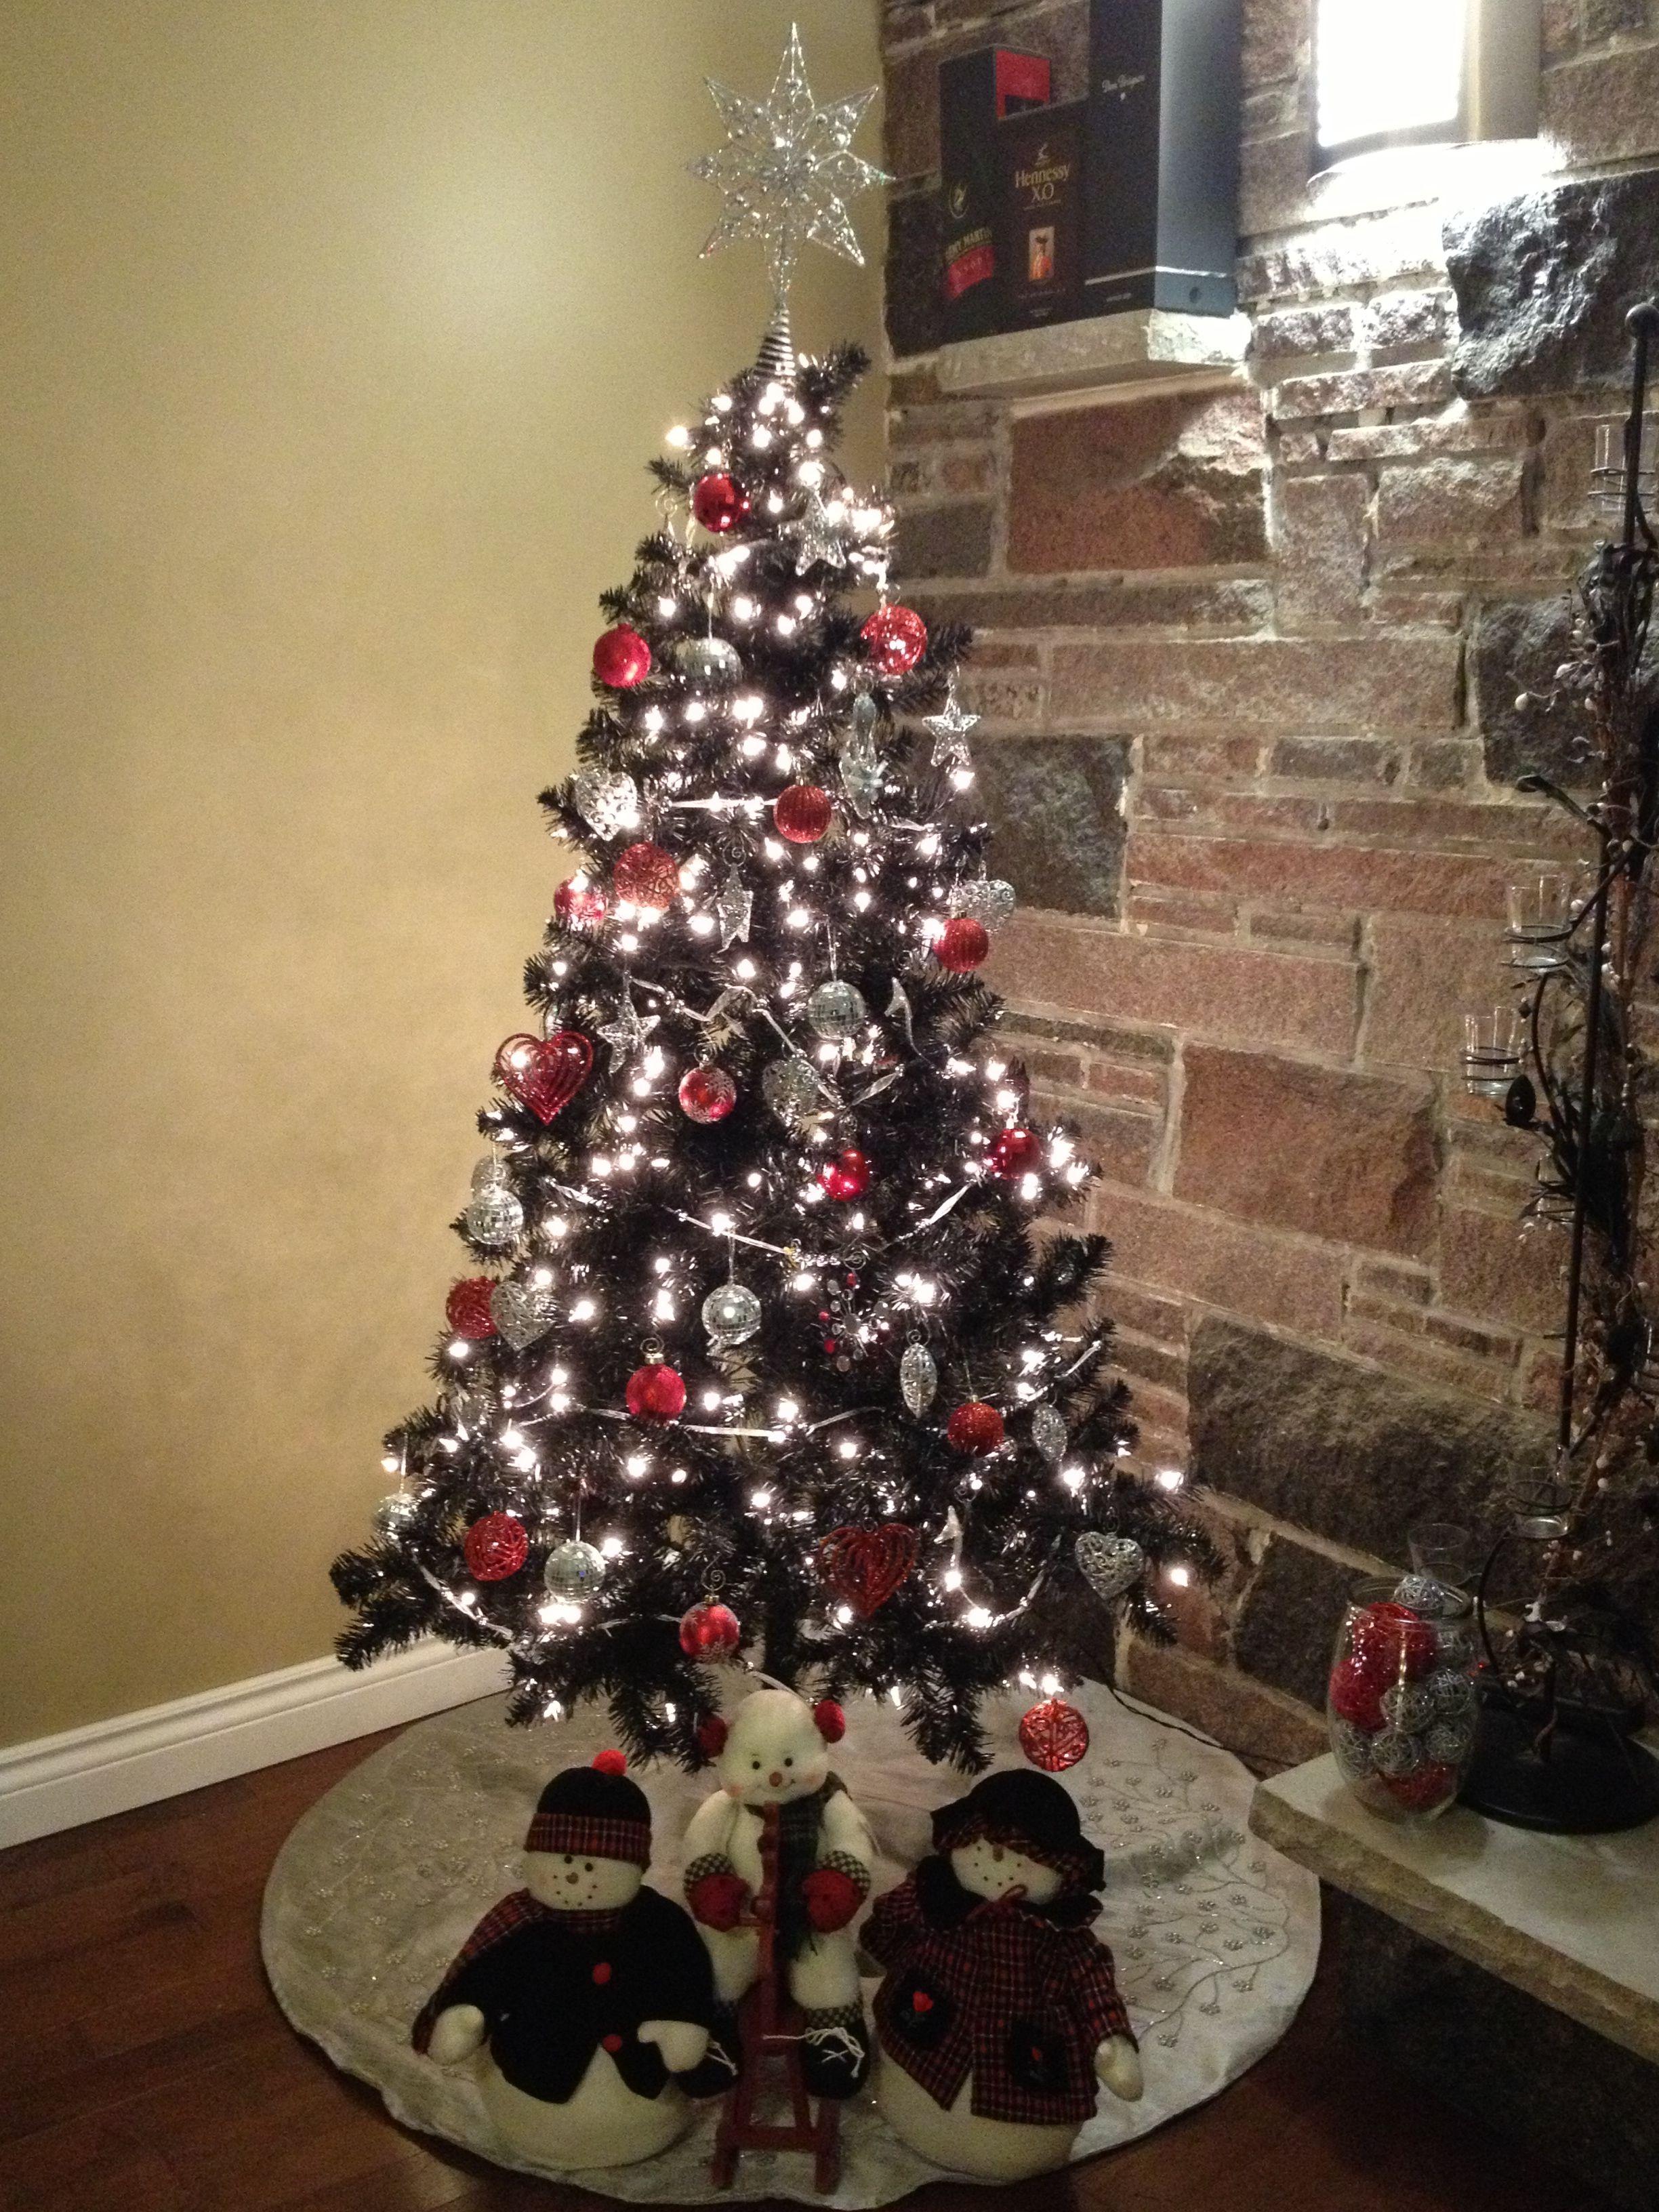 Christmas Tree Home Black Red And Silver Theme Black Christmas Tree Decorations Christmas Tree Silver Christmas Tree